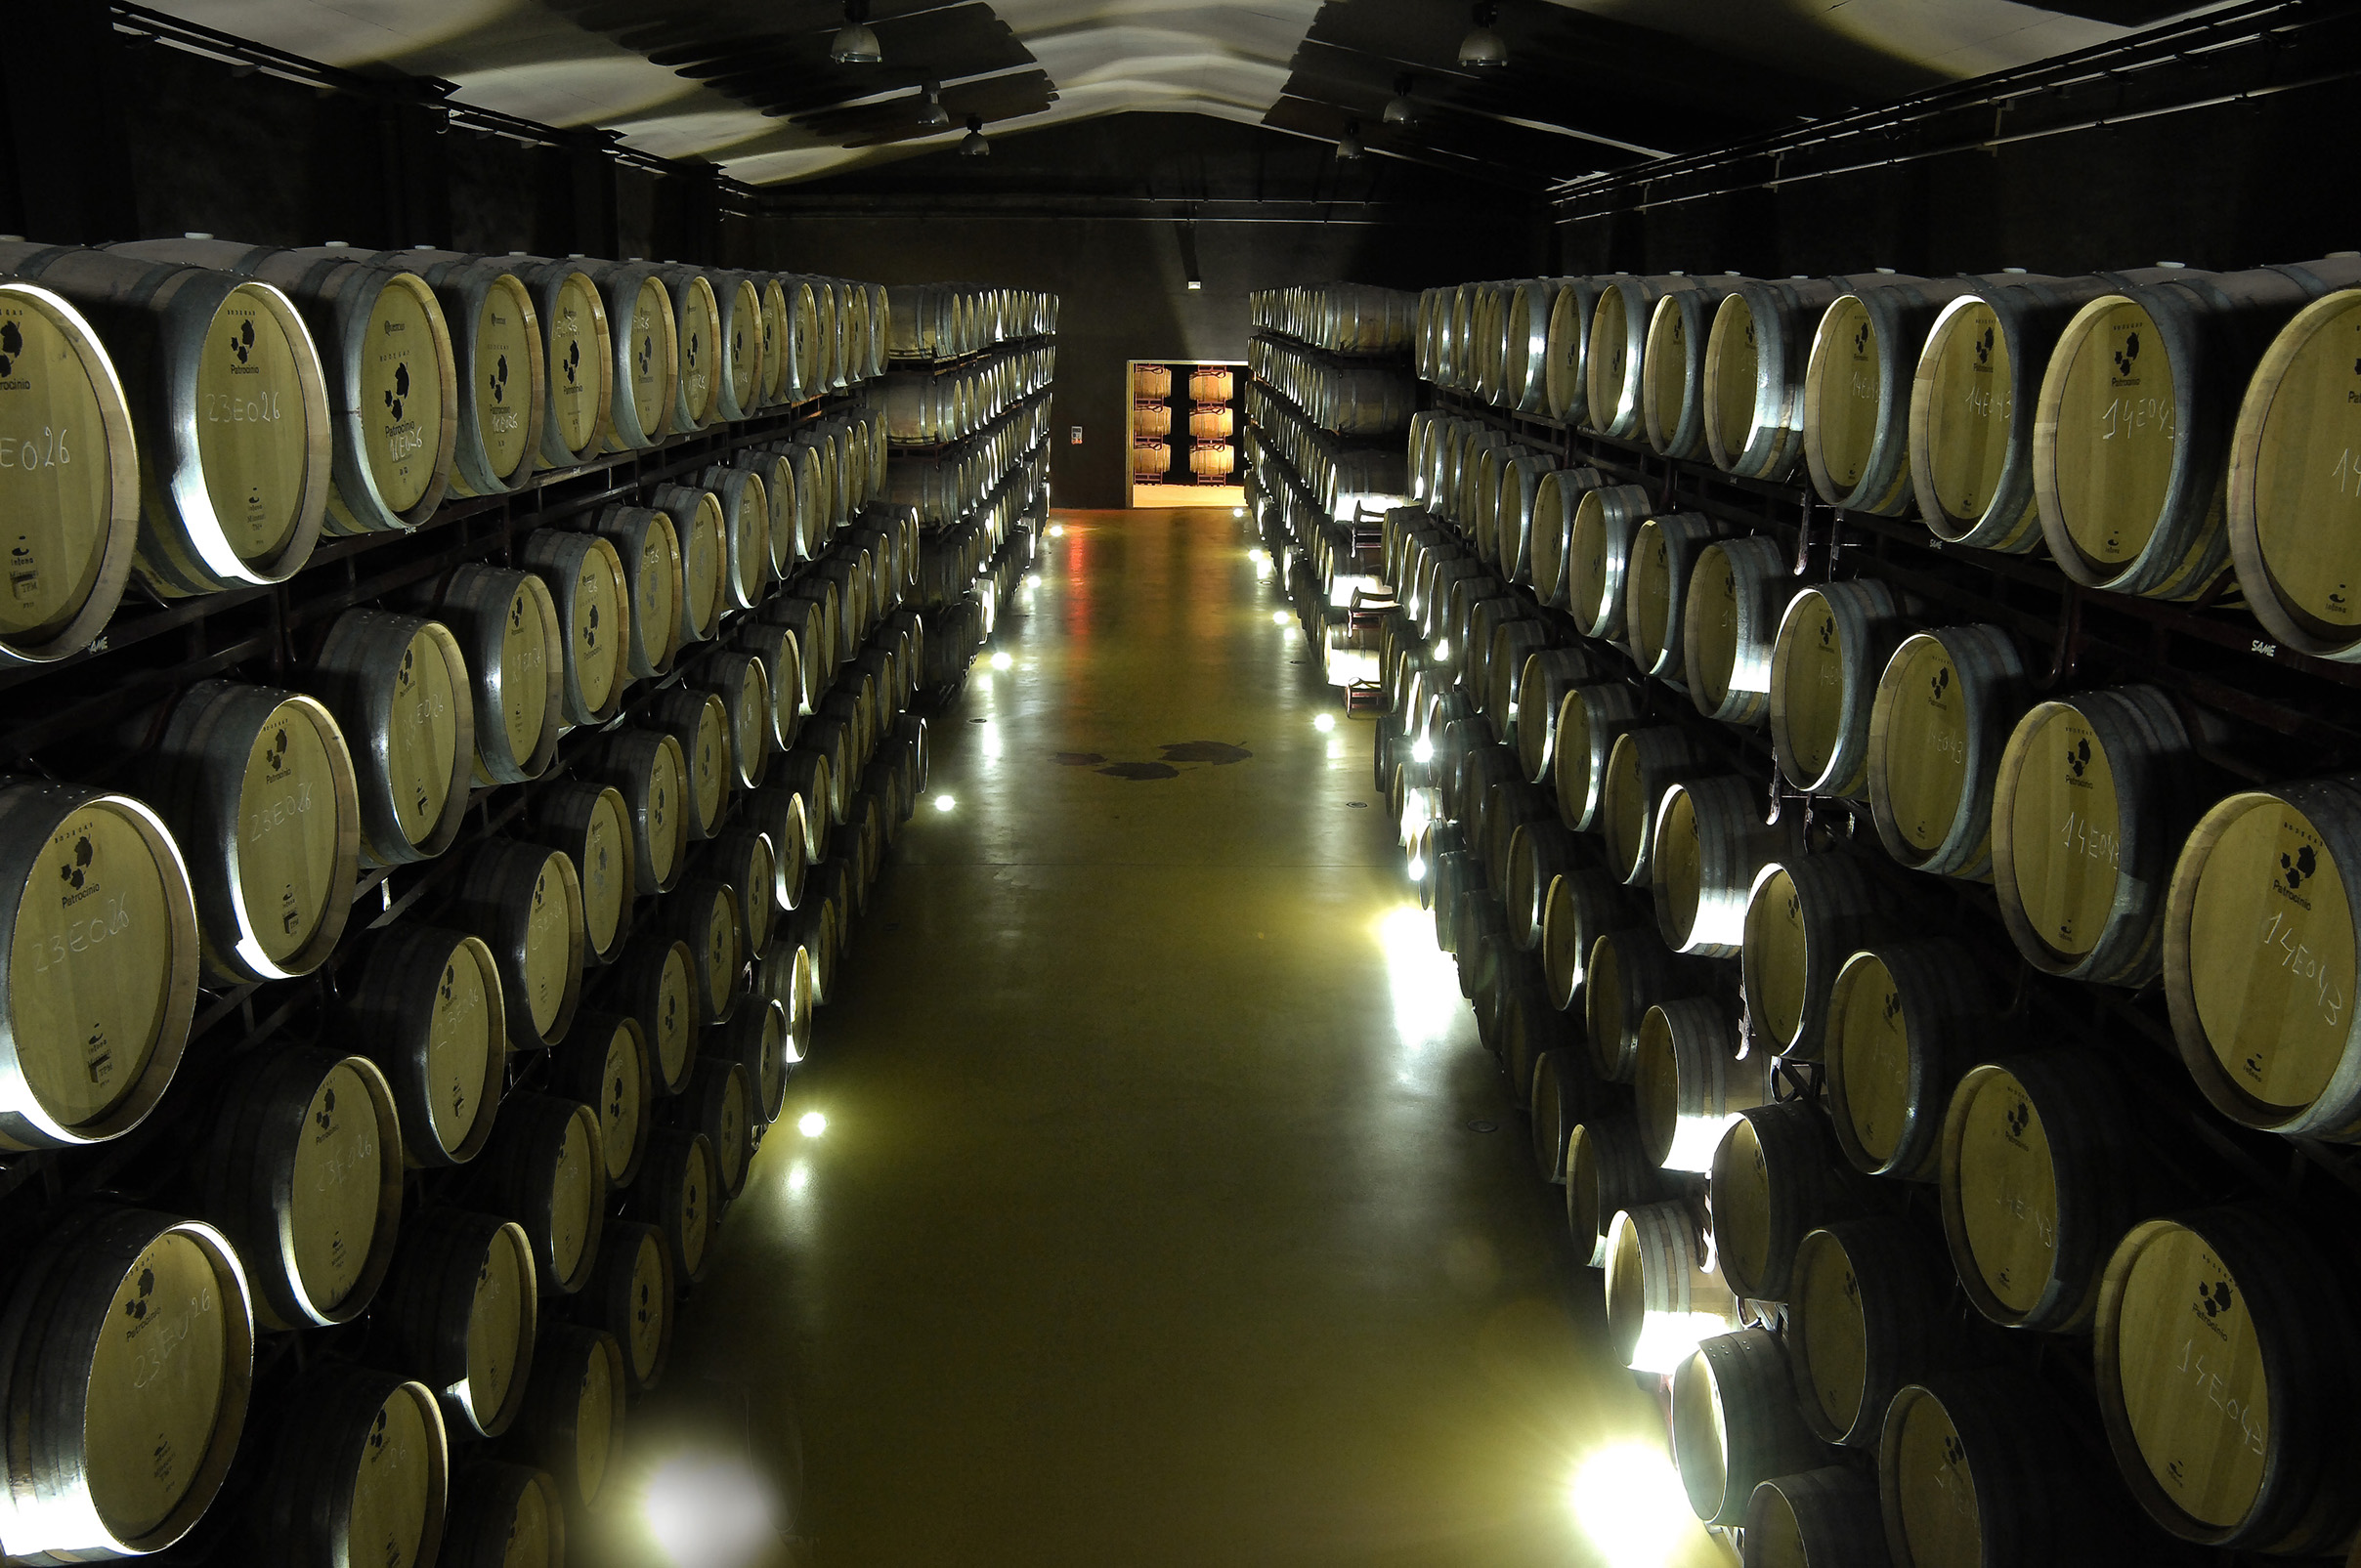 Bodegas Patrocinio España Garnacha Caudalia Wine Box Septiembre 2016